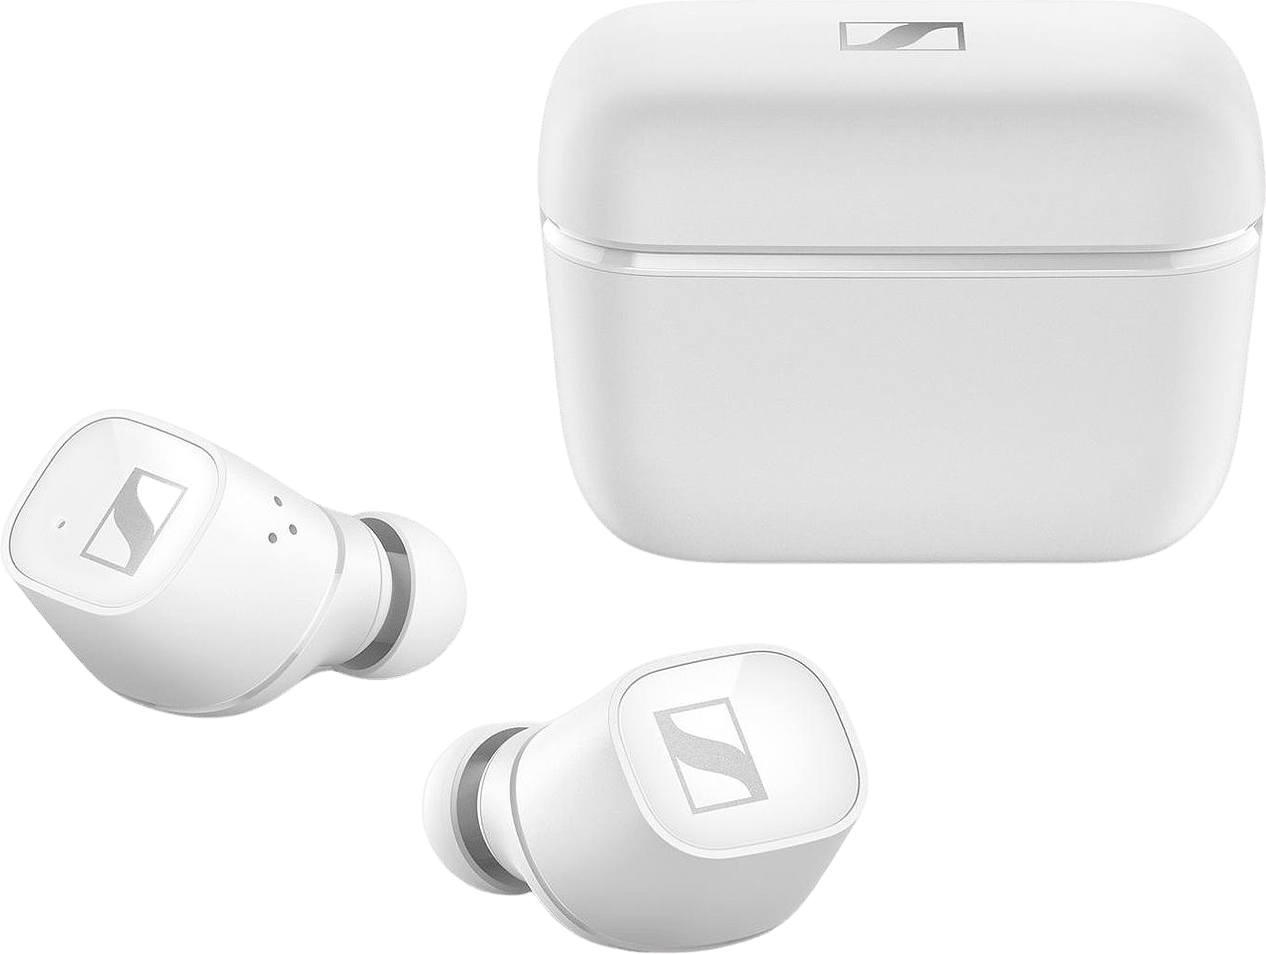 Weiß Sennheiser CX 400BT Noise-cancelling In-ear Bluetooth-Kopfhörer.1